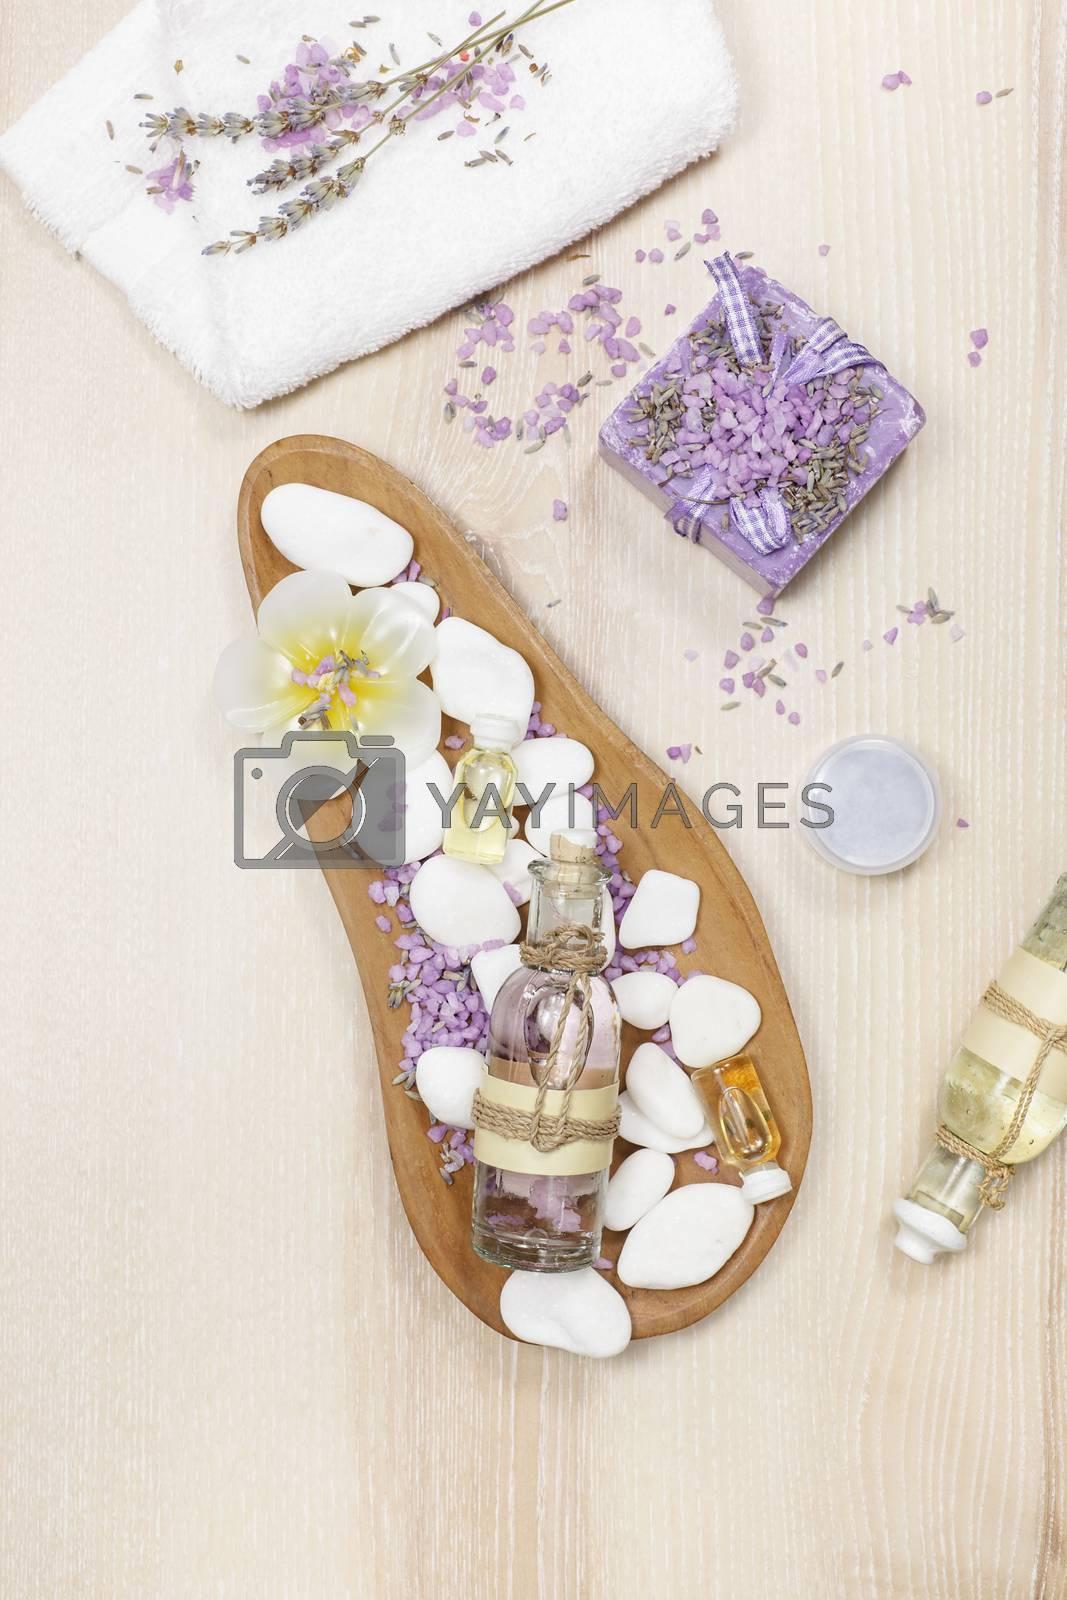 Lavender spa set by Slast20